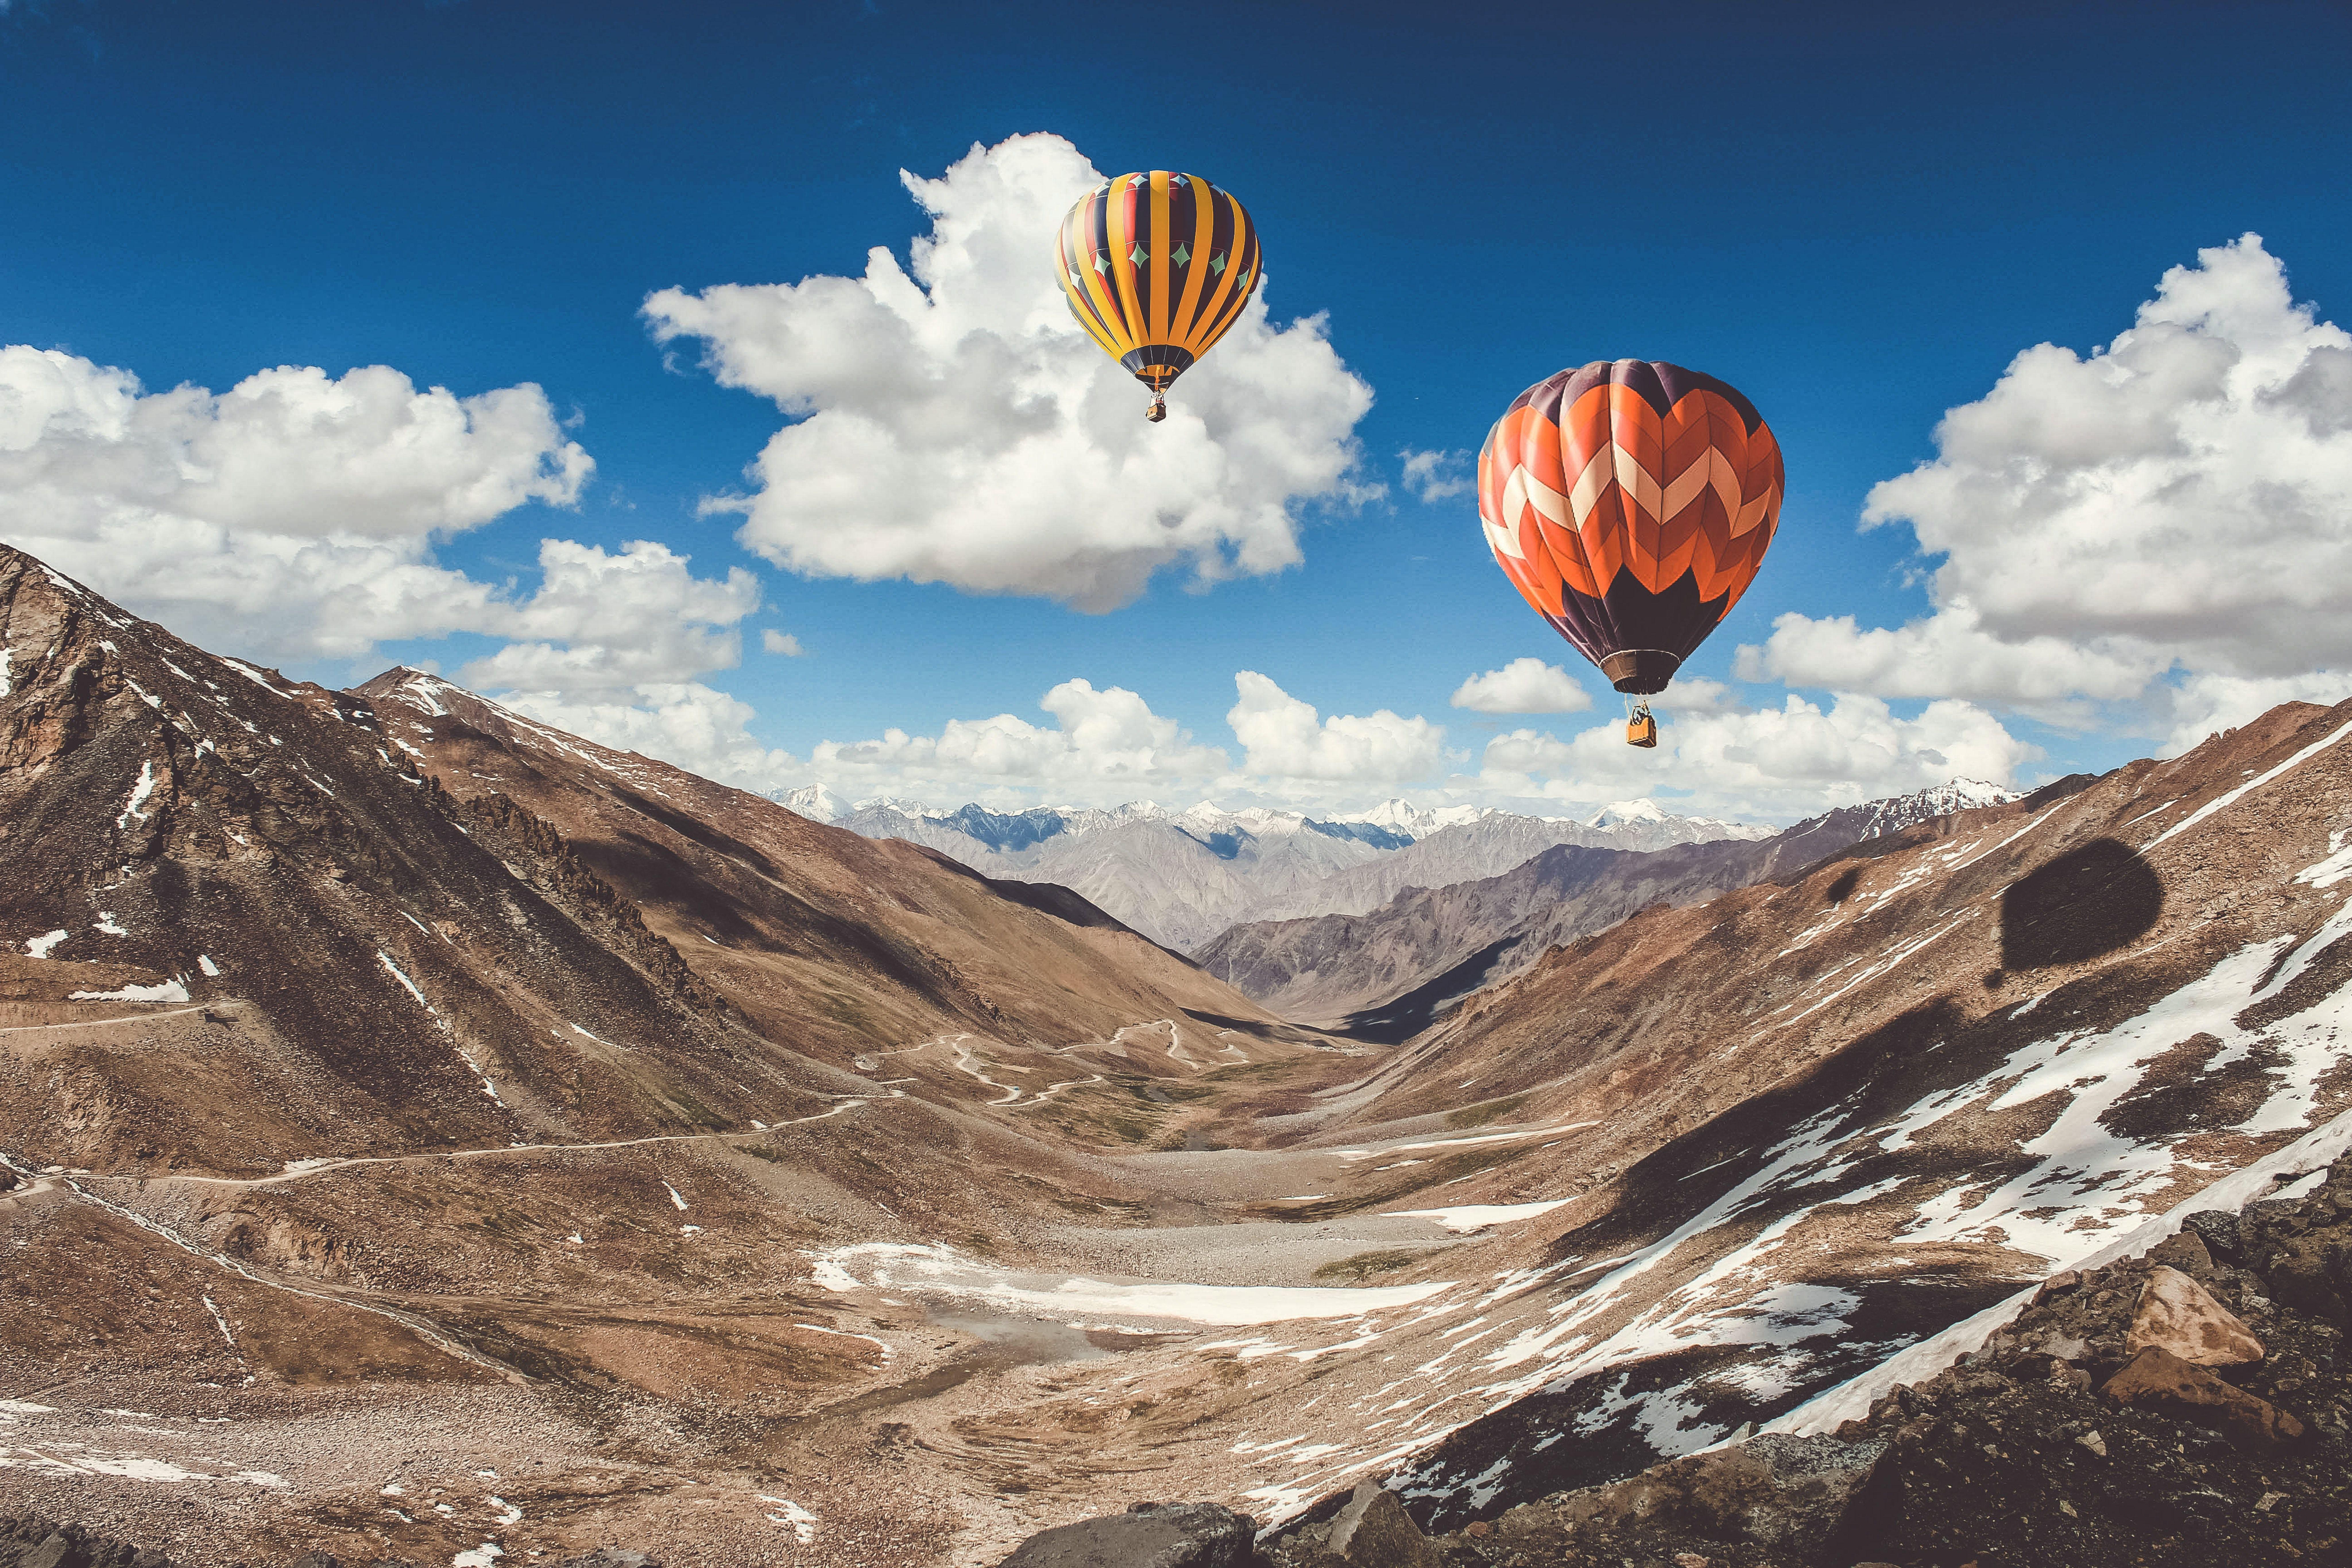 Balloon in mountain photo by S S (@thecutewanderer) on ...